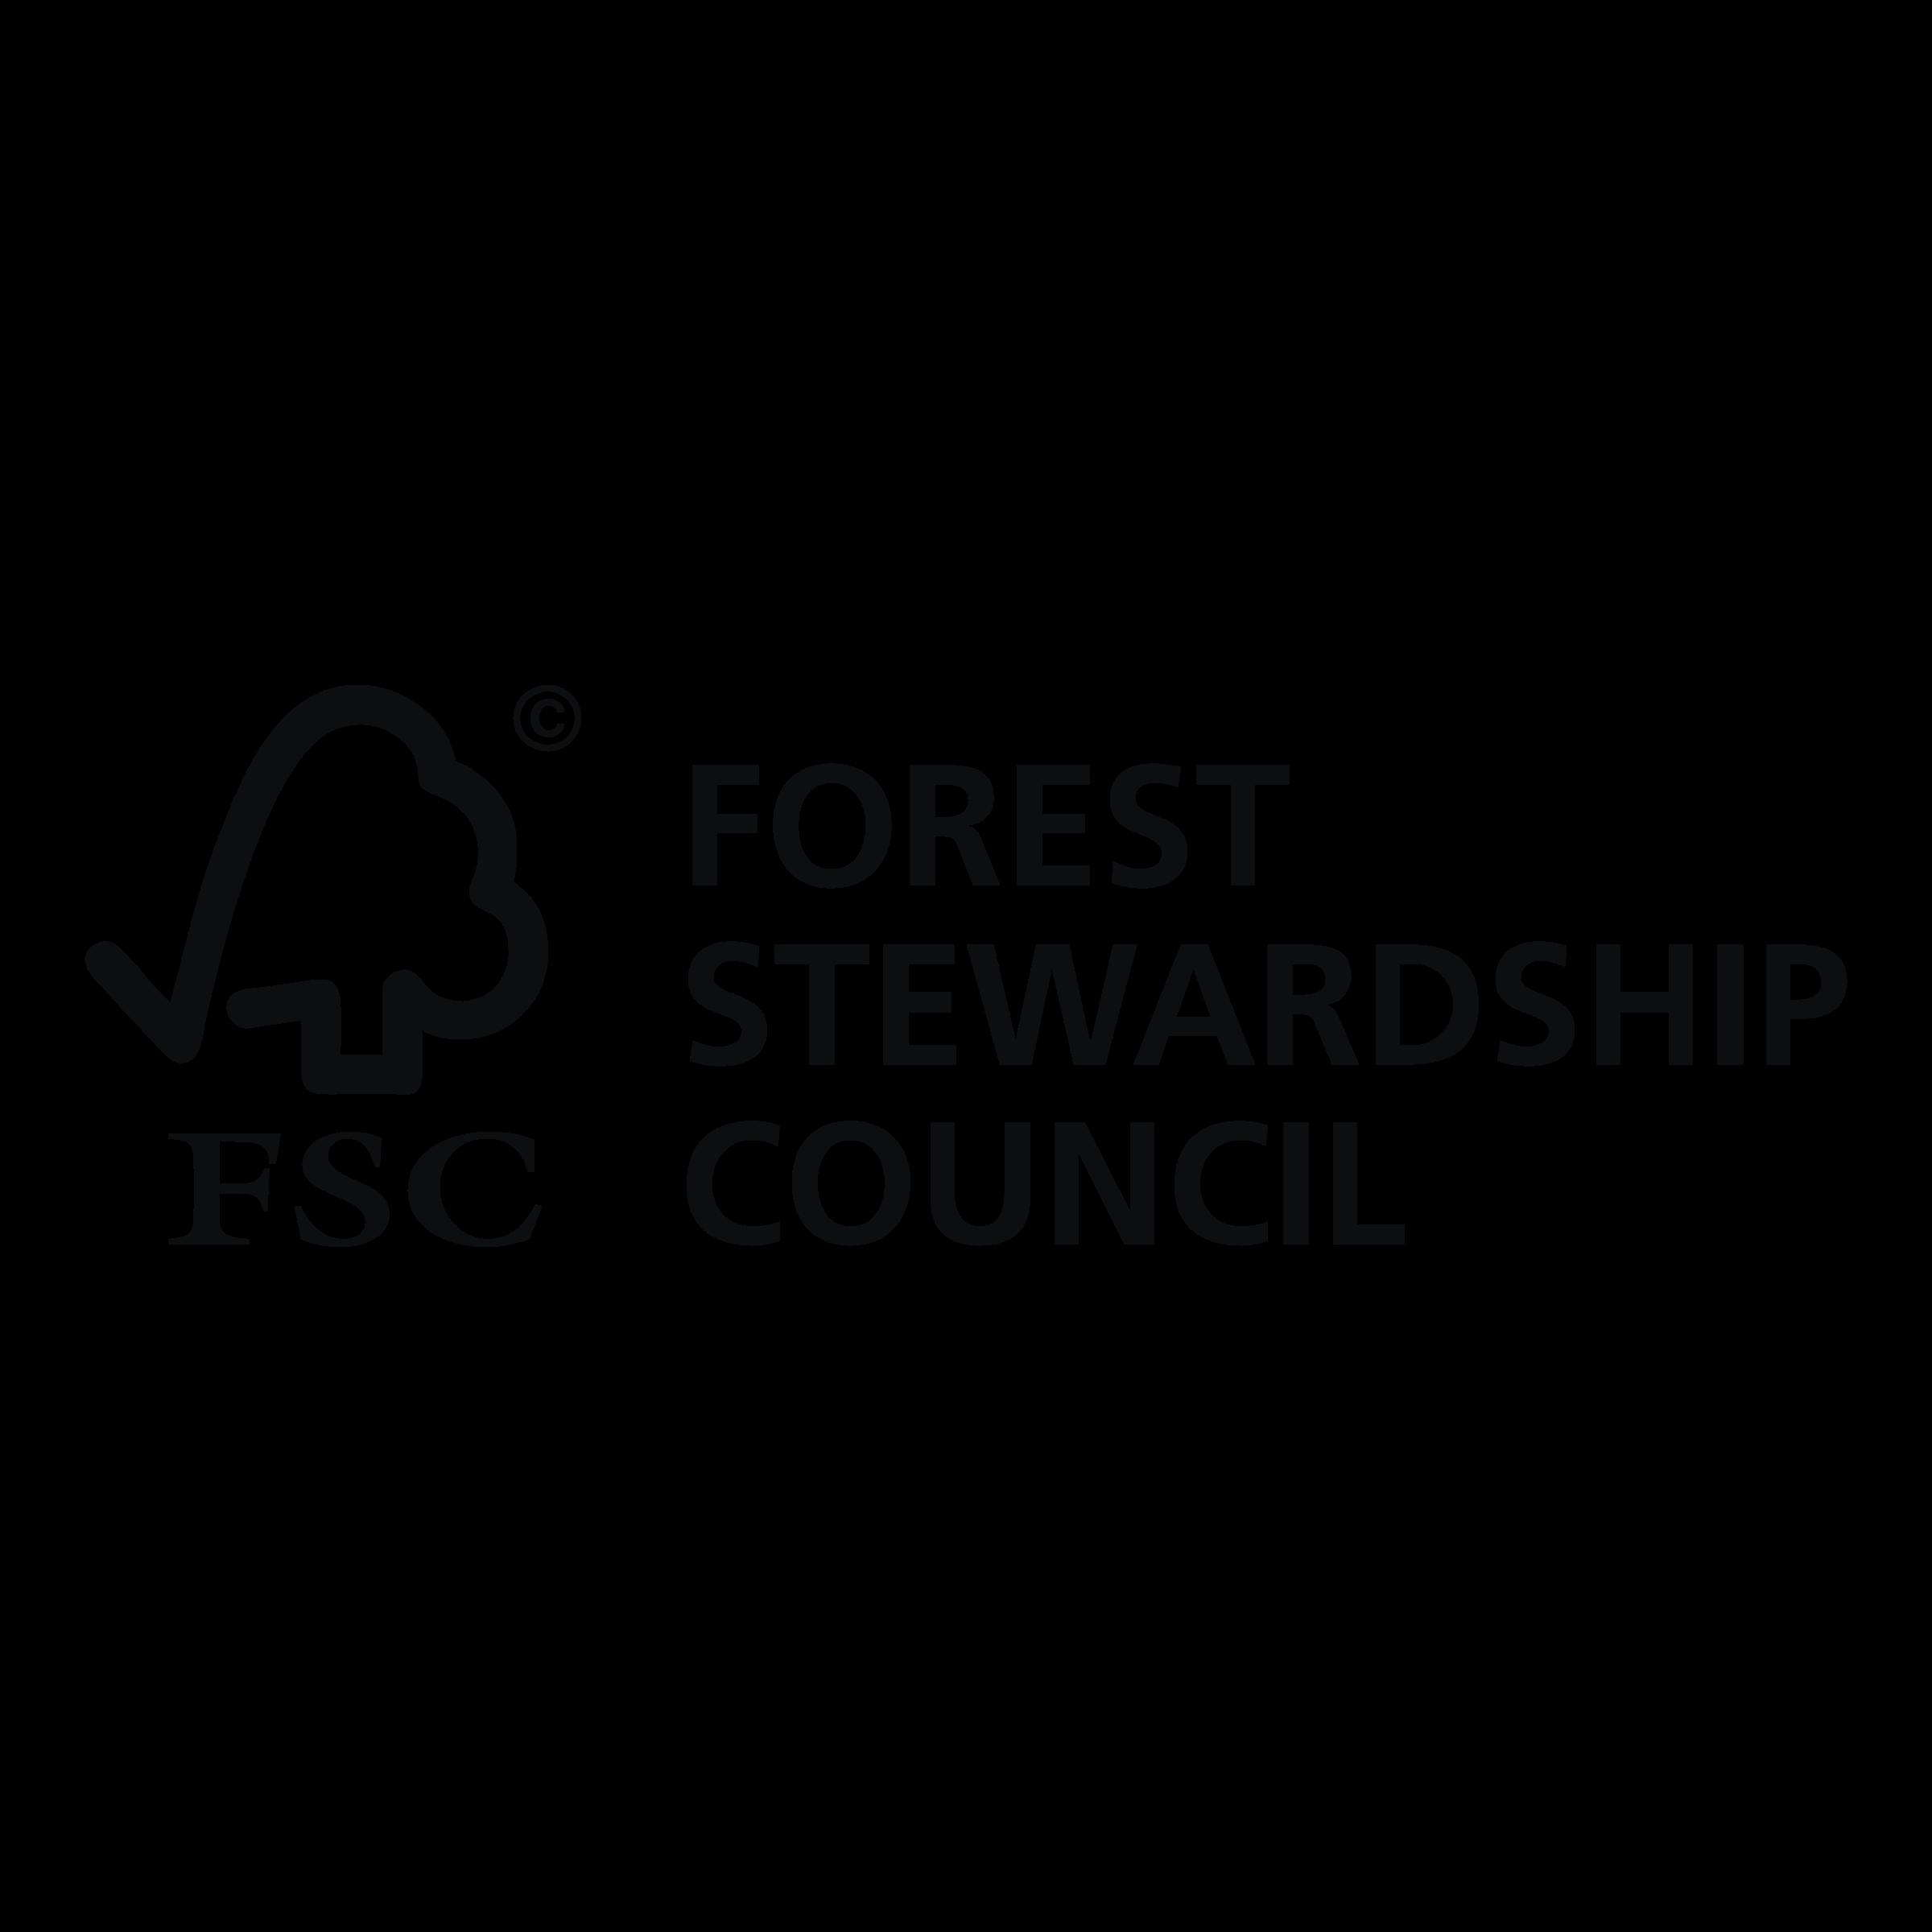 FSC Logo PNG Transparent & SVG Vector.